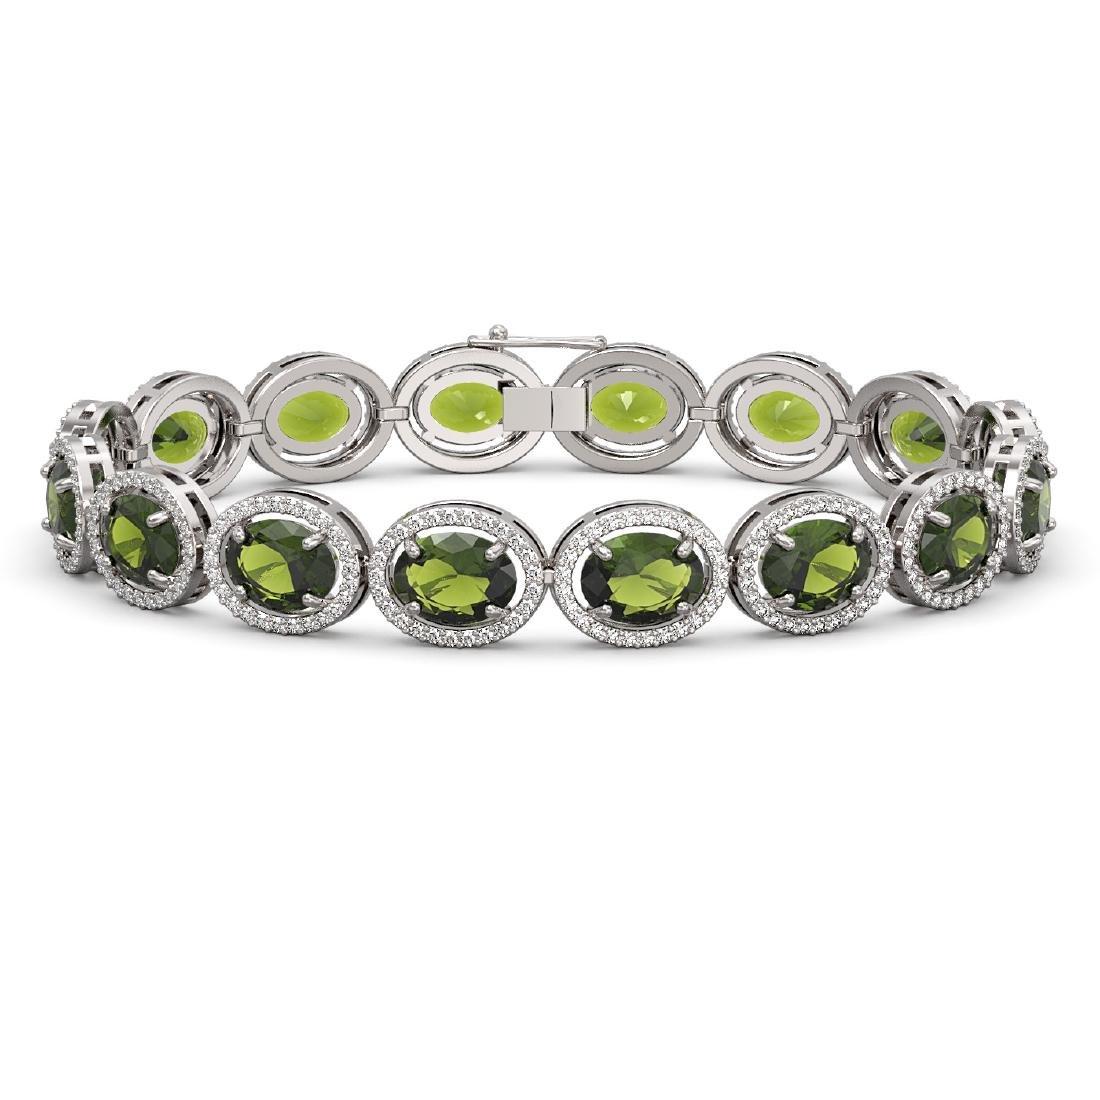 23.6 CTW Tourmaline & Diamond Halo Bracelet 10K White